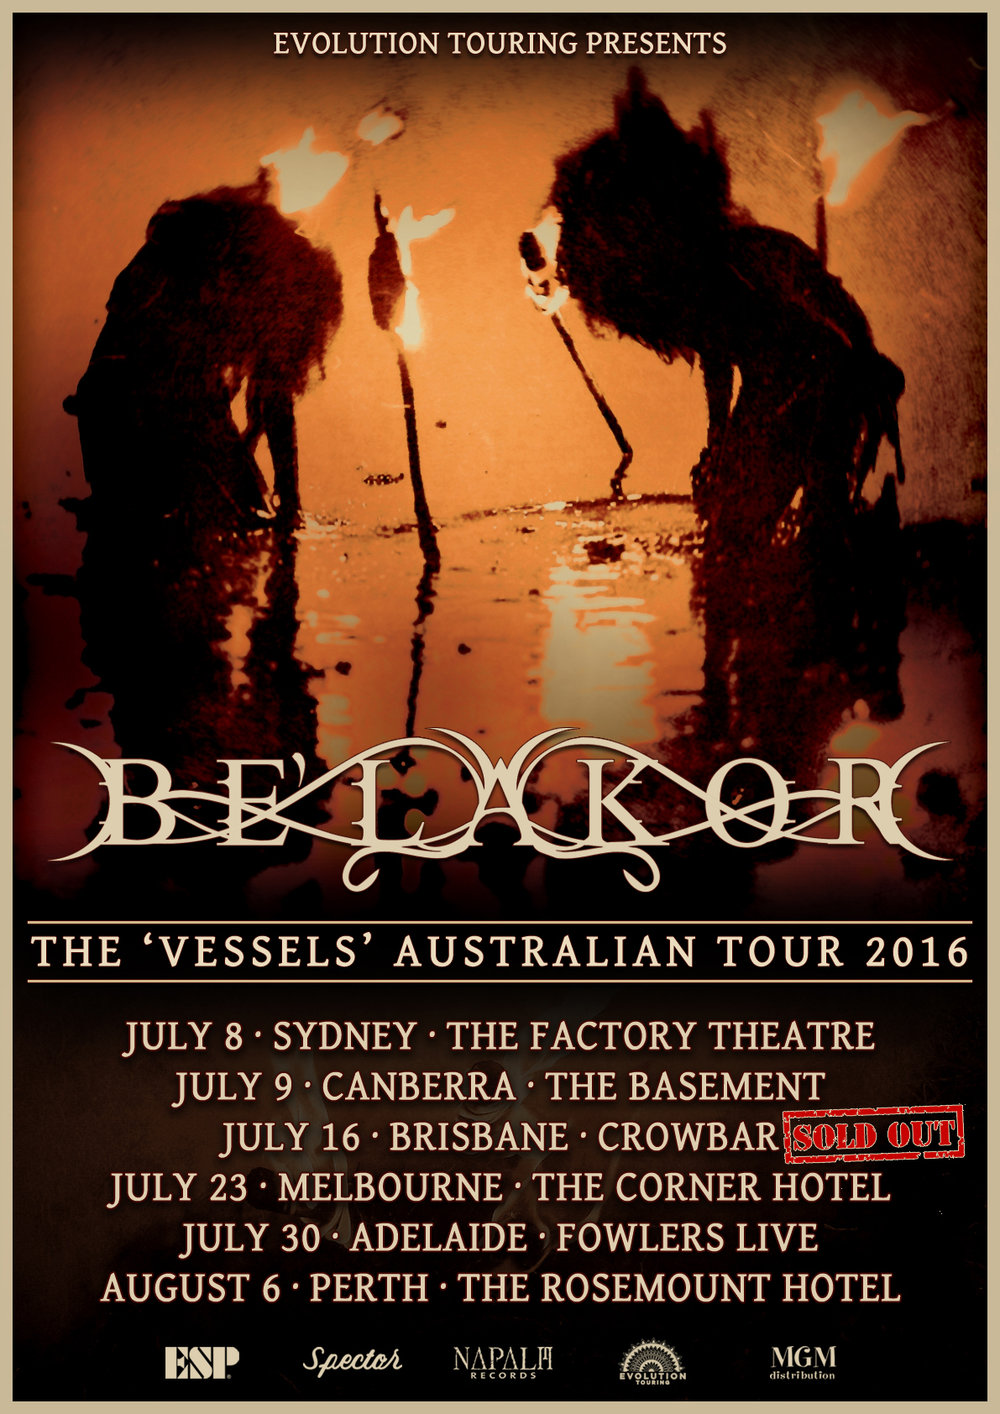 Be'lakor (AUS) - Australian Tour